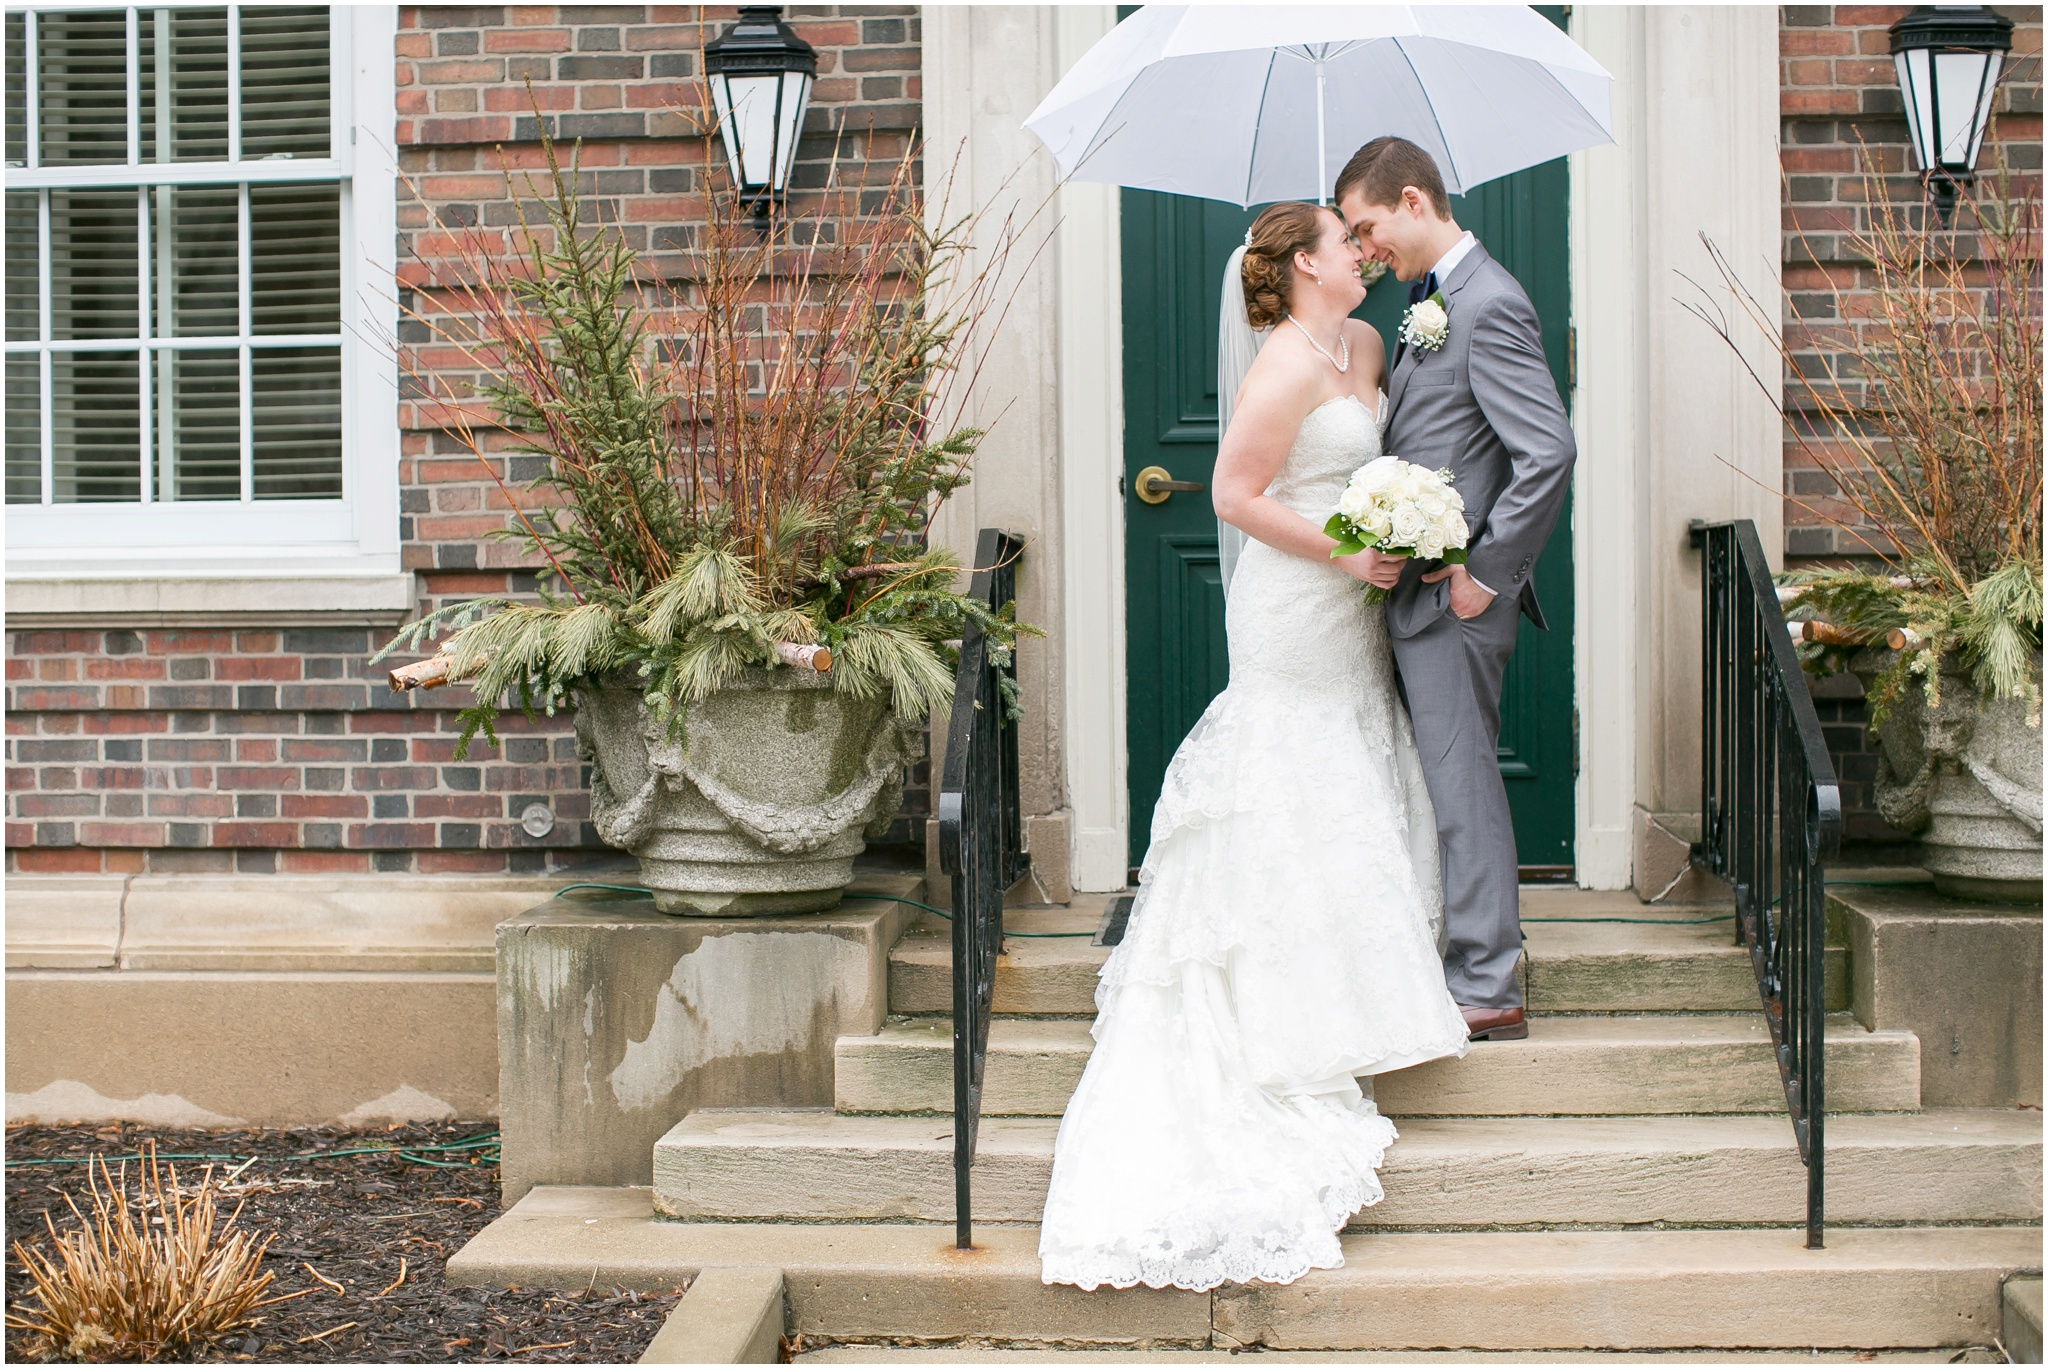 Madison_Club_Madison_Wisconsin_Wedding_Photographer_Spring_Rainy_Wedding_2616.jpg